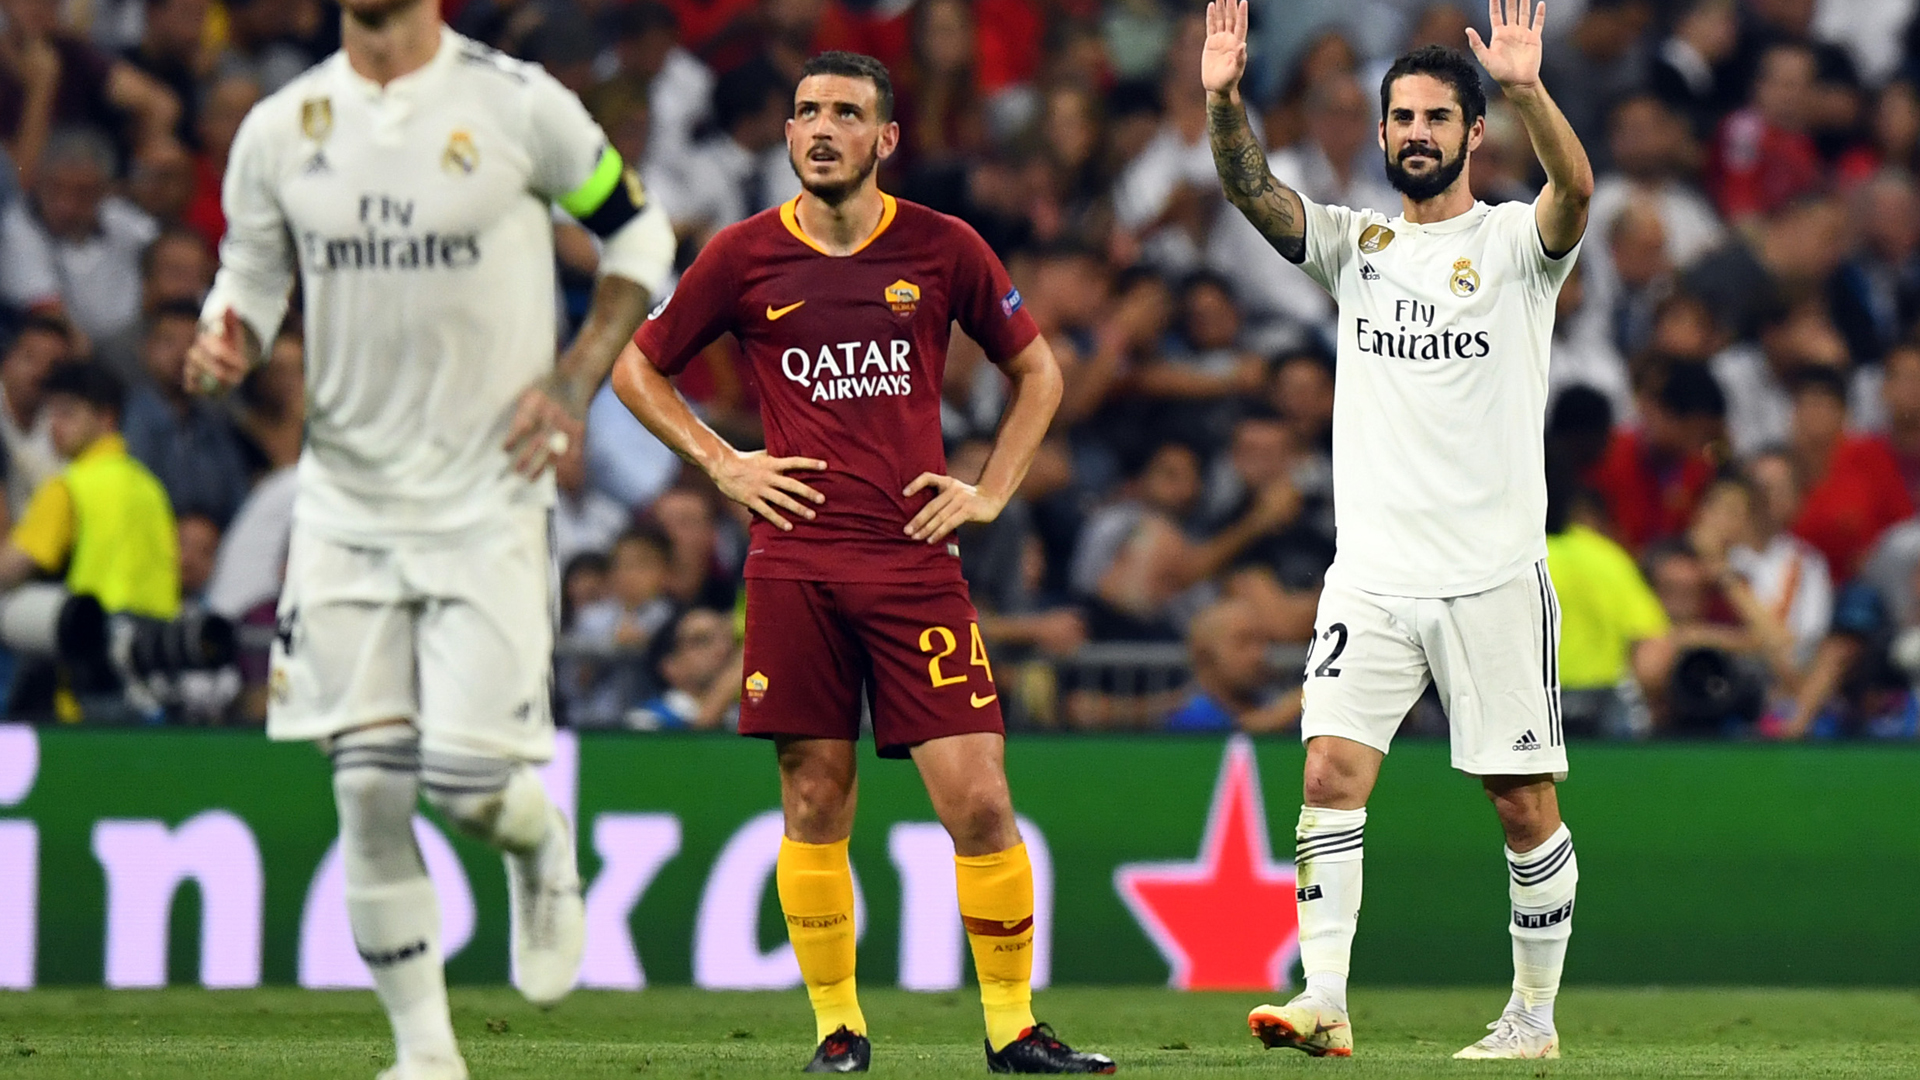 Florenzi Isco Real Madrid Roma Champions League